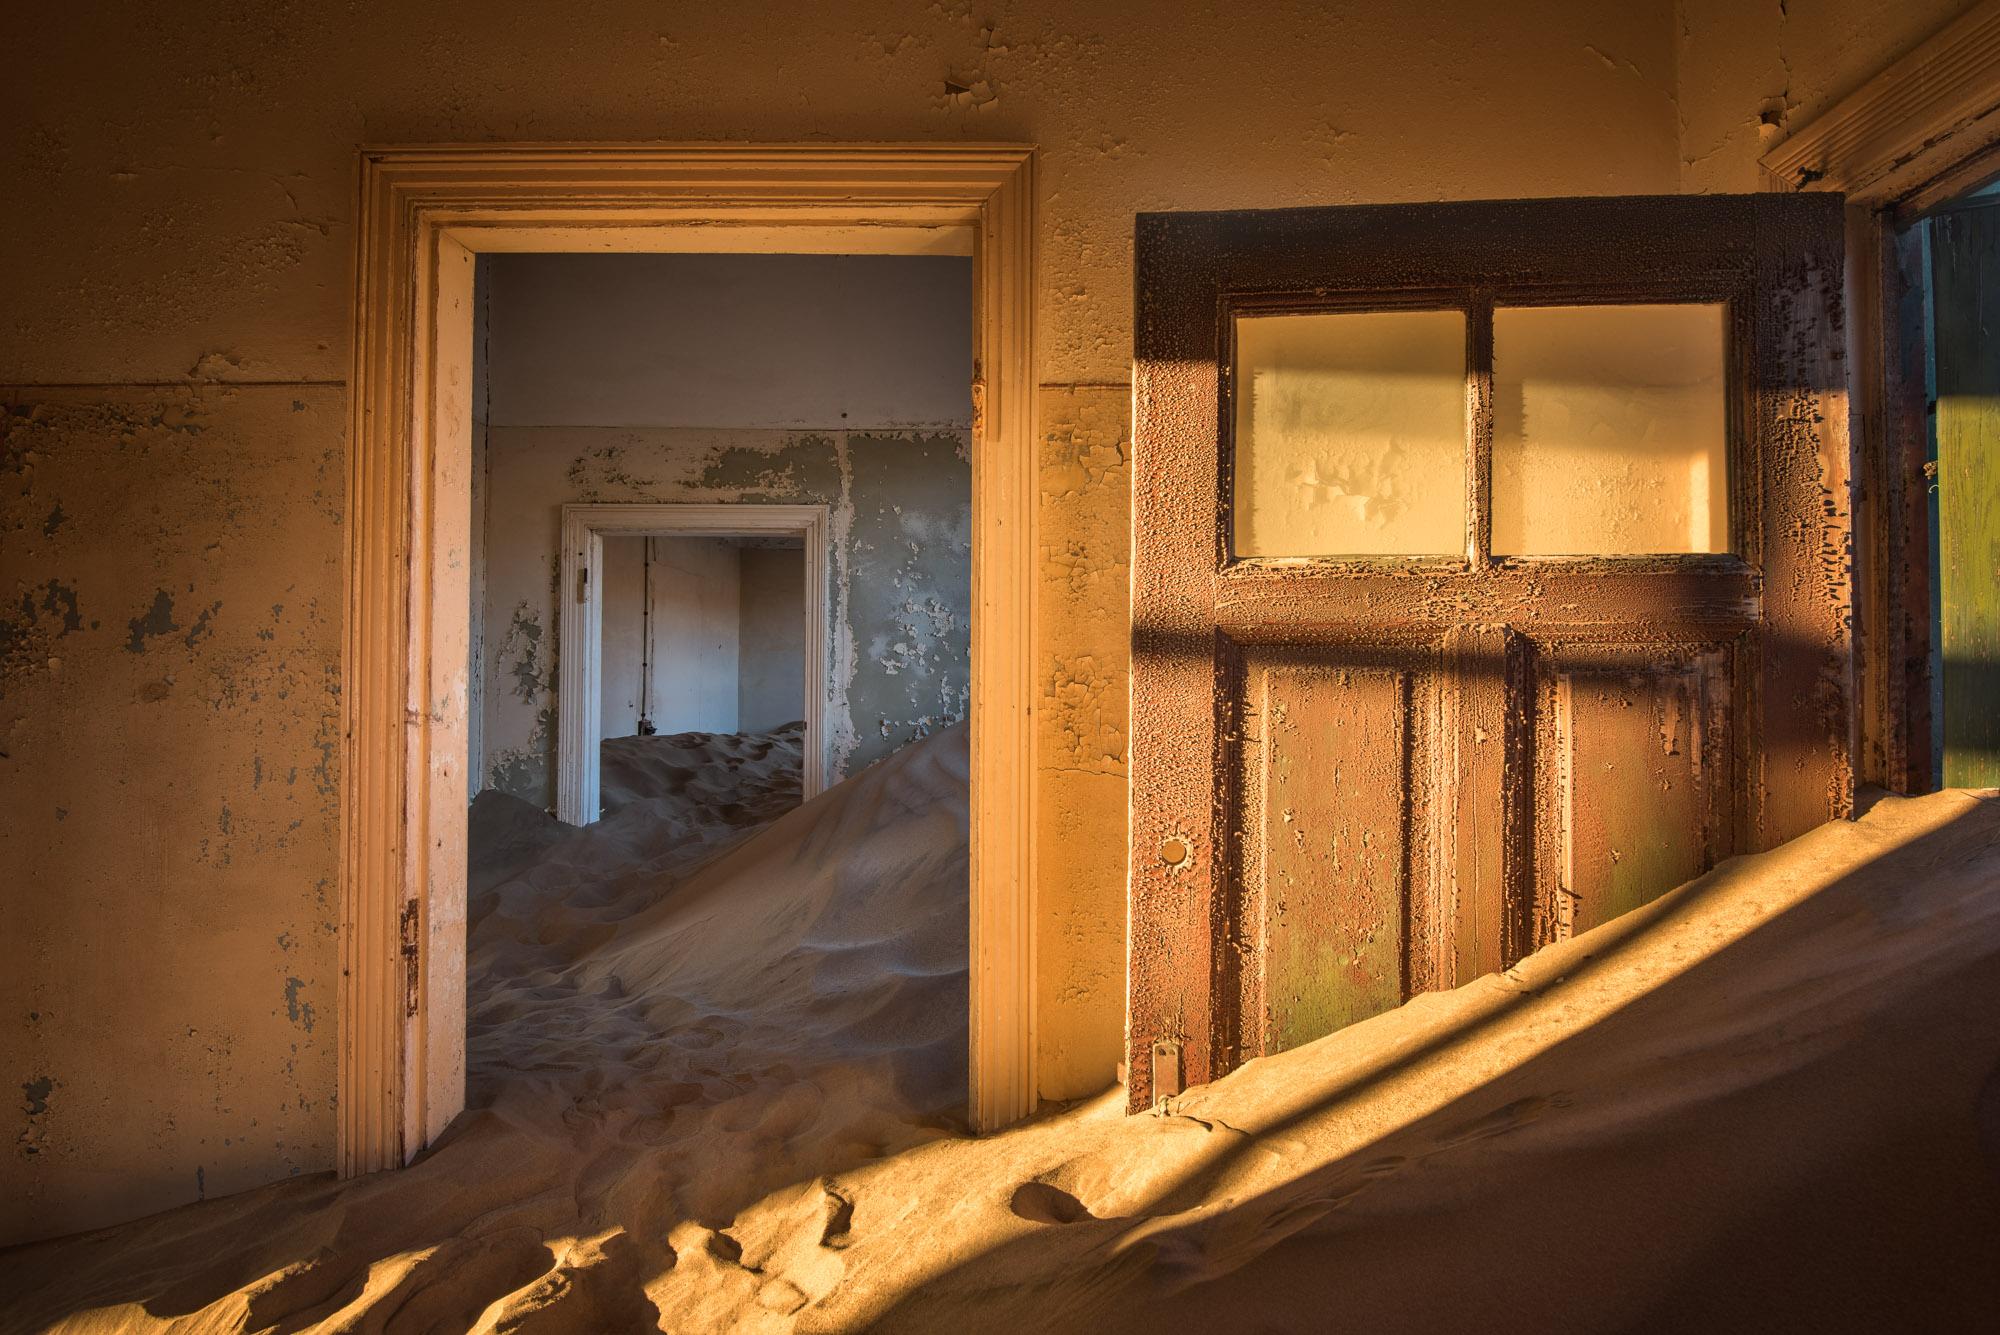 Abandoned House, Ghost Town of Kolmanskop, Namibia